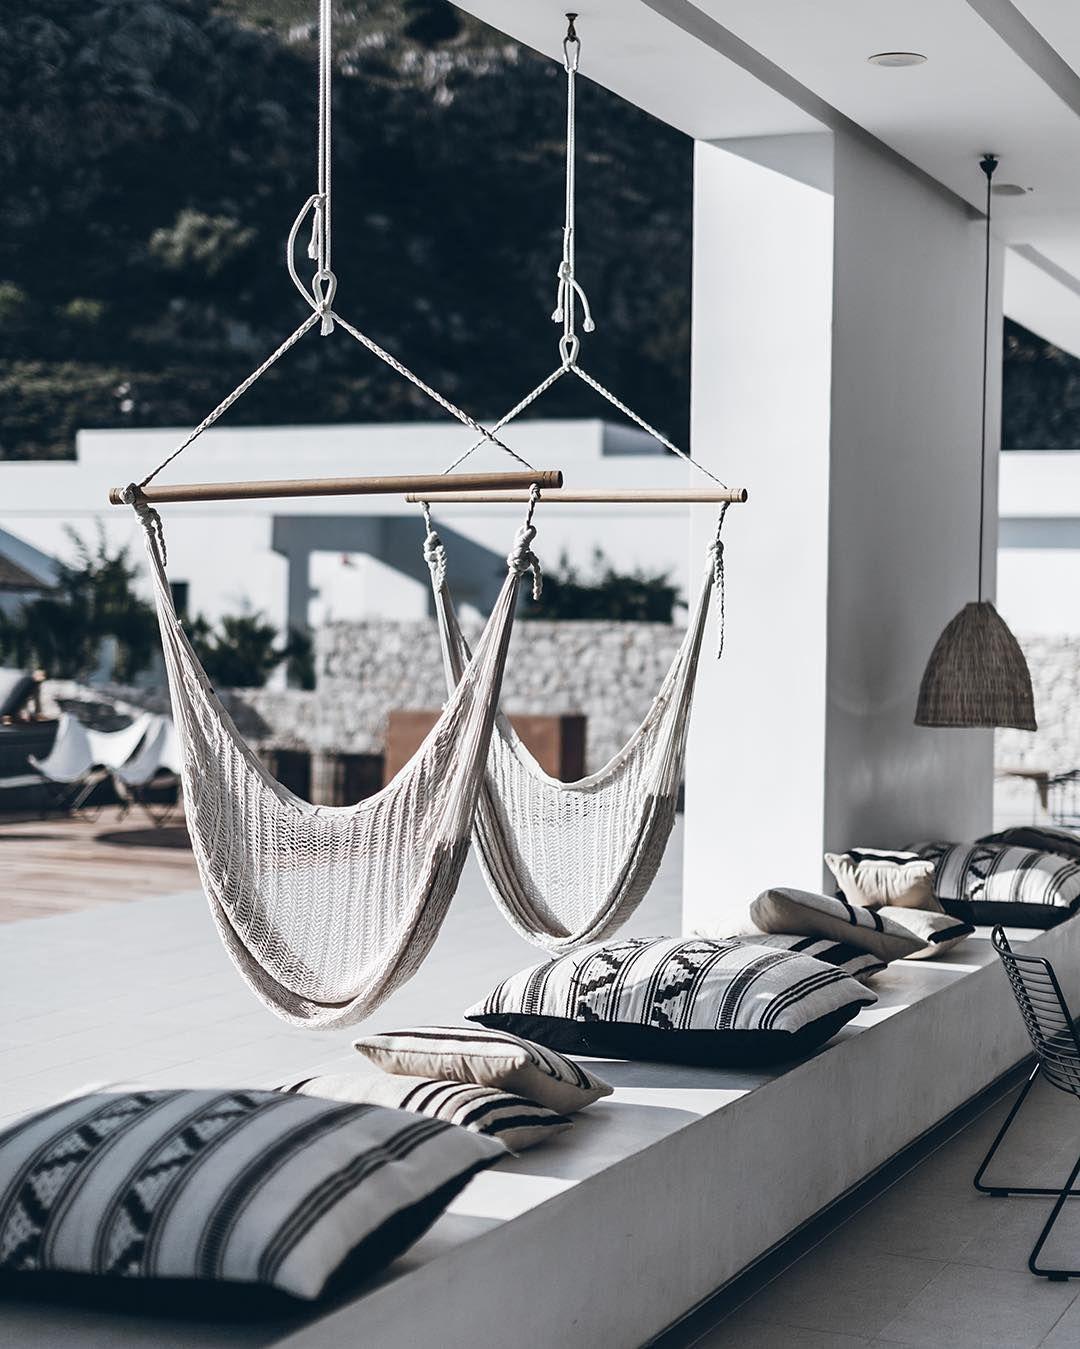 Casacookrhodes u instagram photos and videos holiday homes